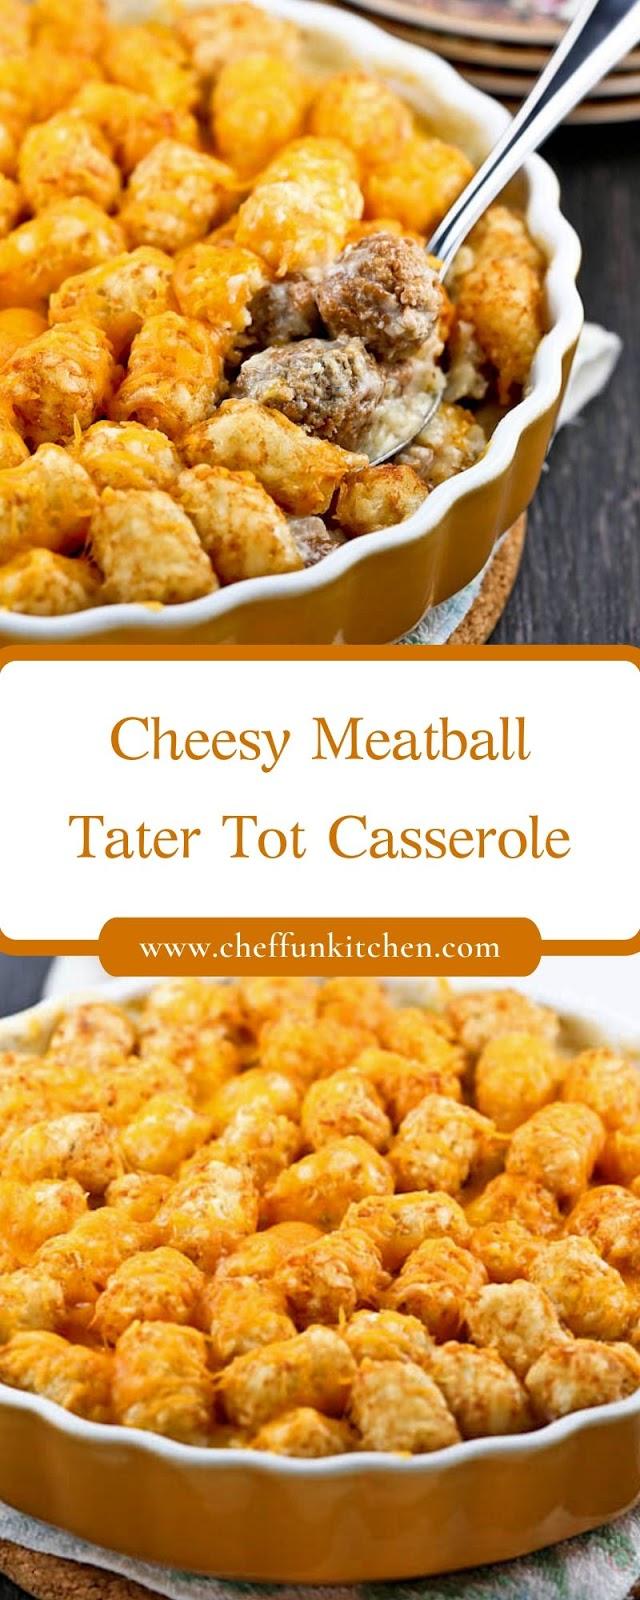 Cheesy Meatball Tater Tot Casserole